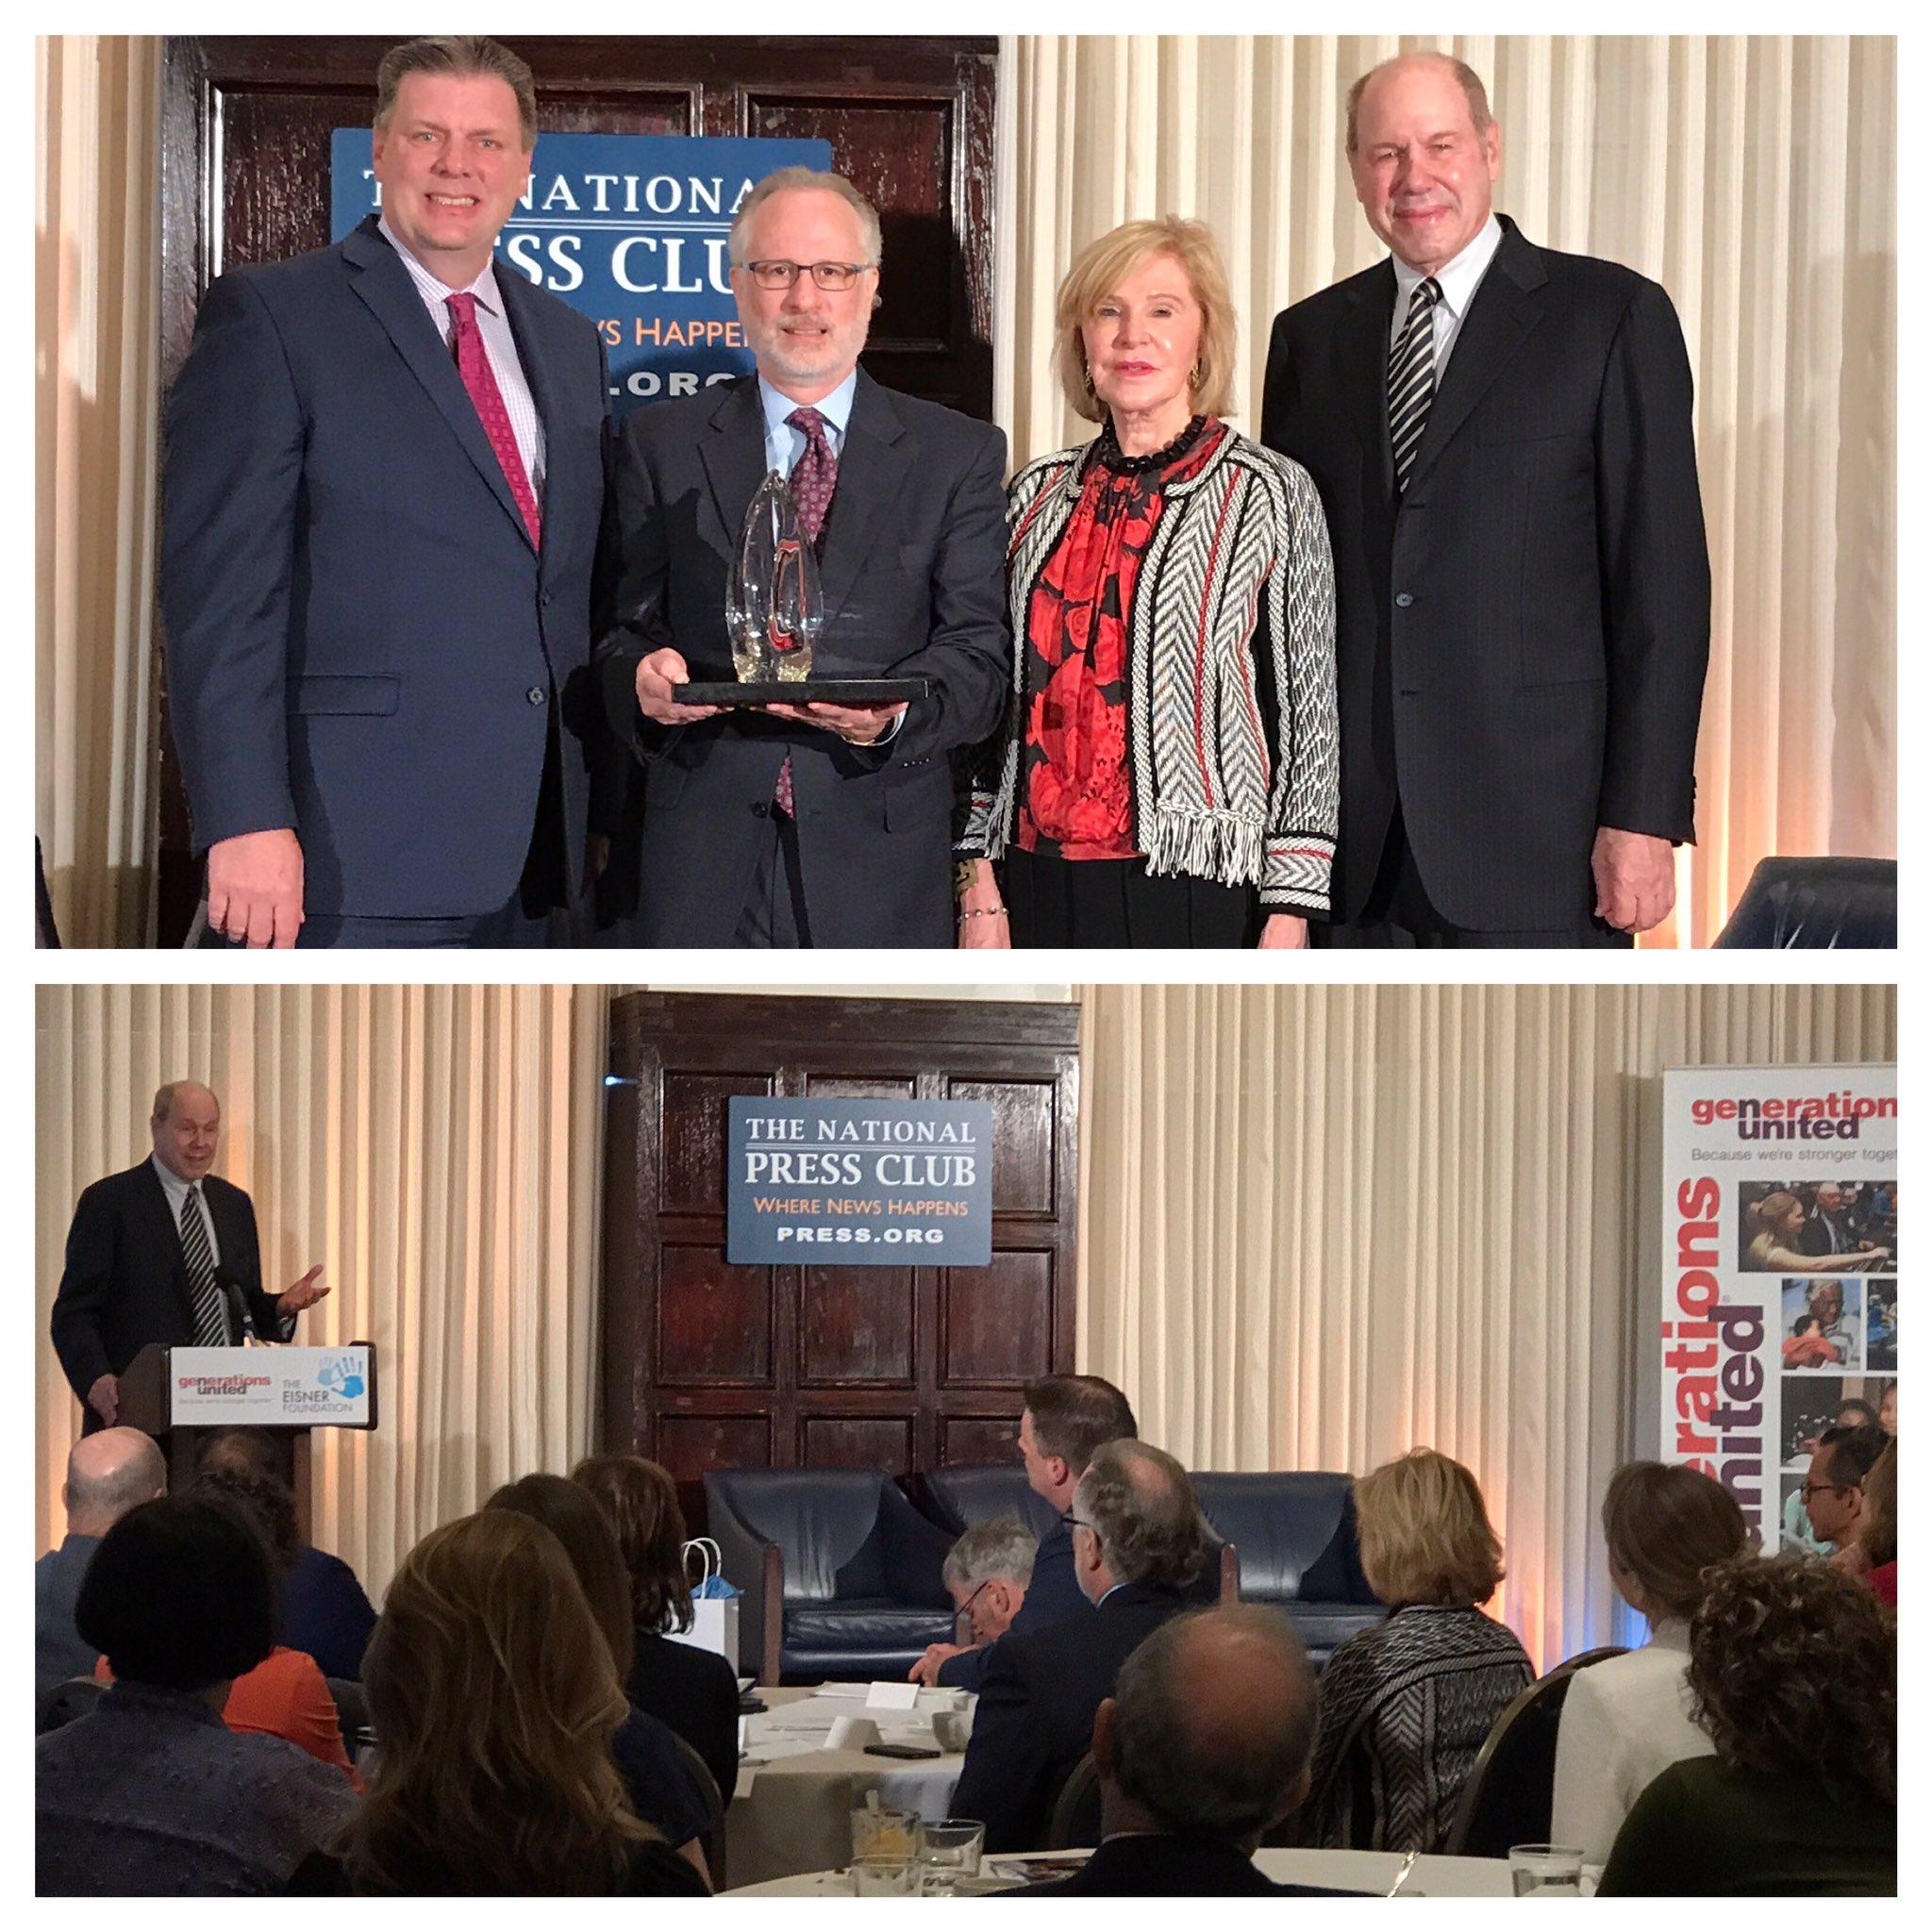 Honored to be in Washington DC to award the #EisnerPrize to @DOROTUSA ! #UnitedWeThrive @EisnerFound @GensUnited https://t.co/kcM3rGfVEa